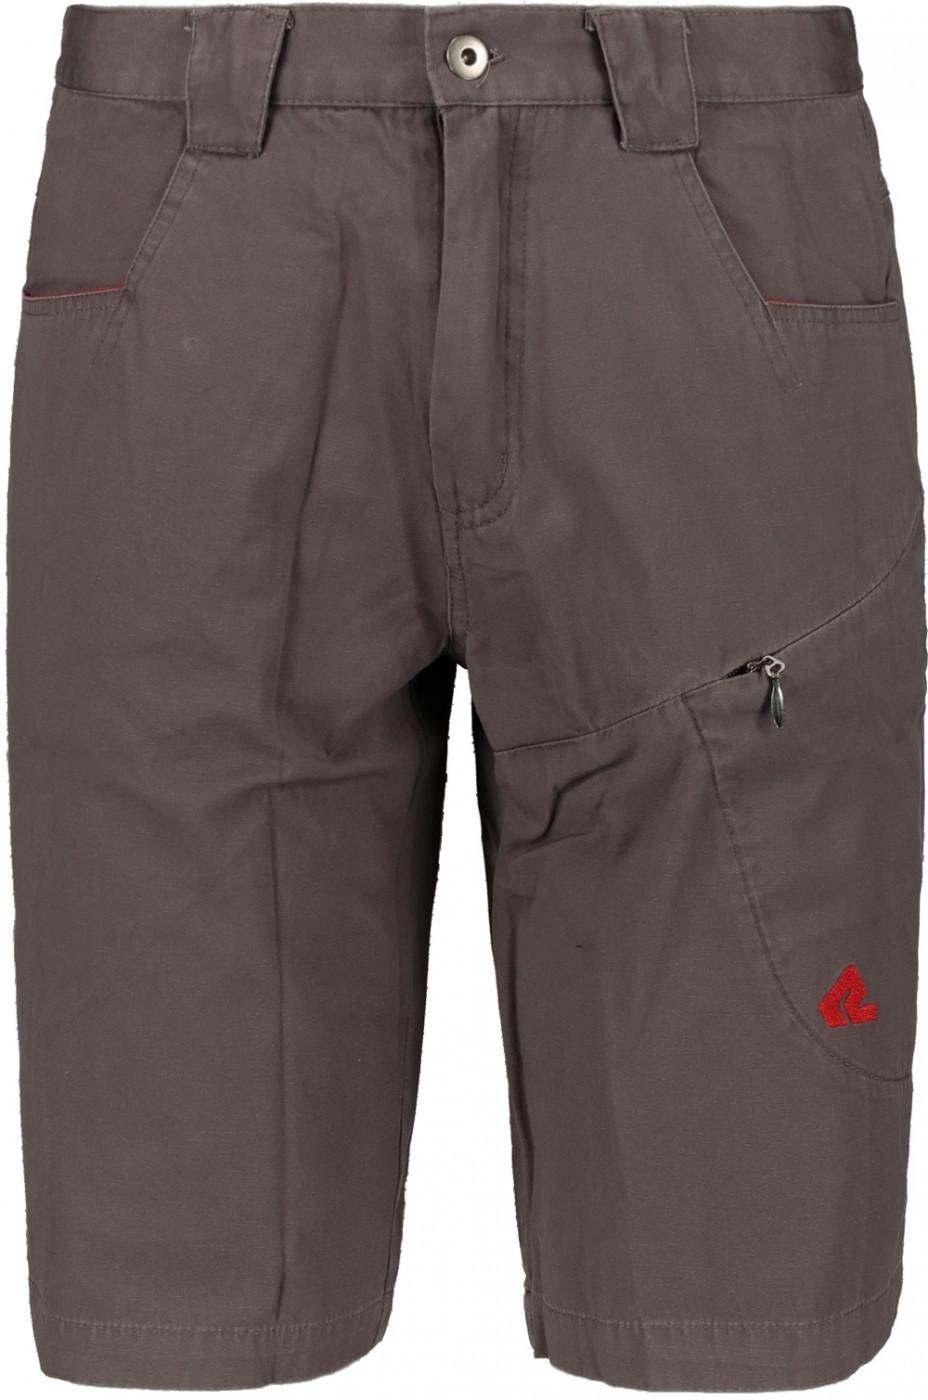 Men's shorts ERCO SEDON-M